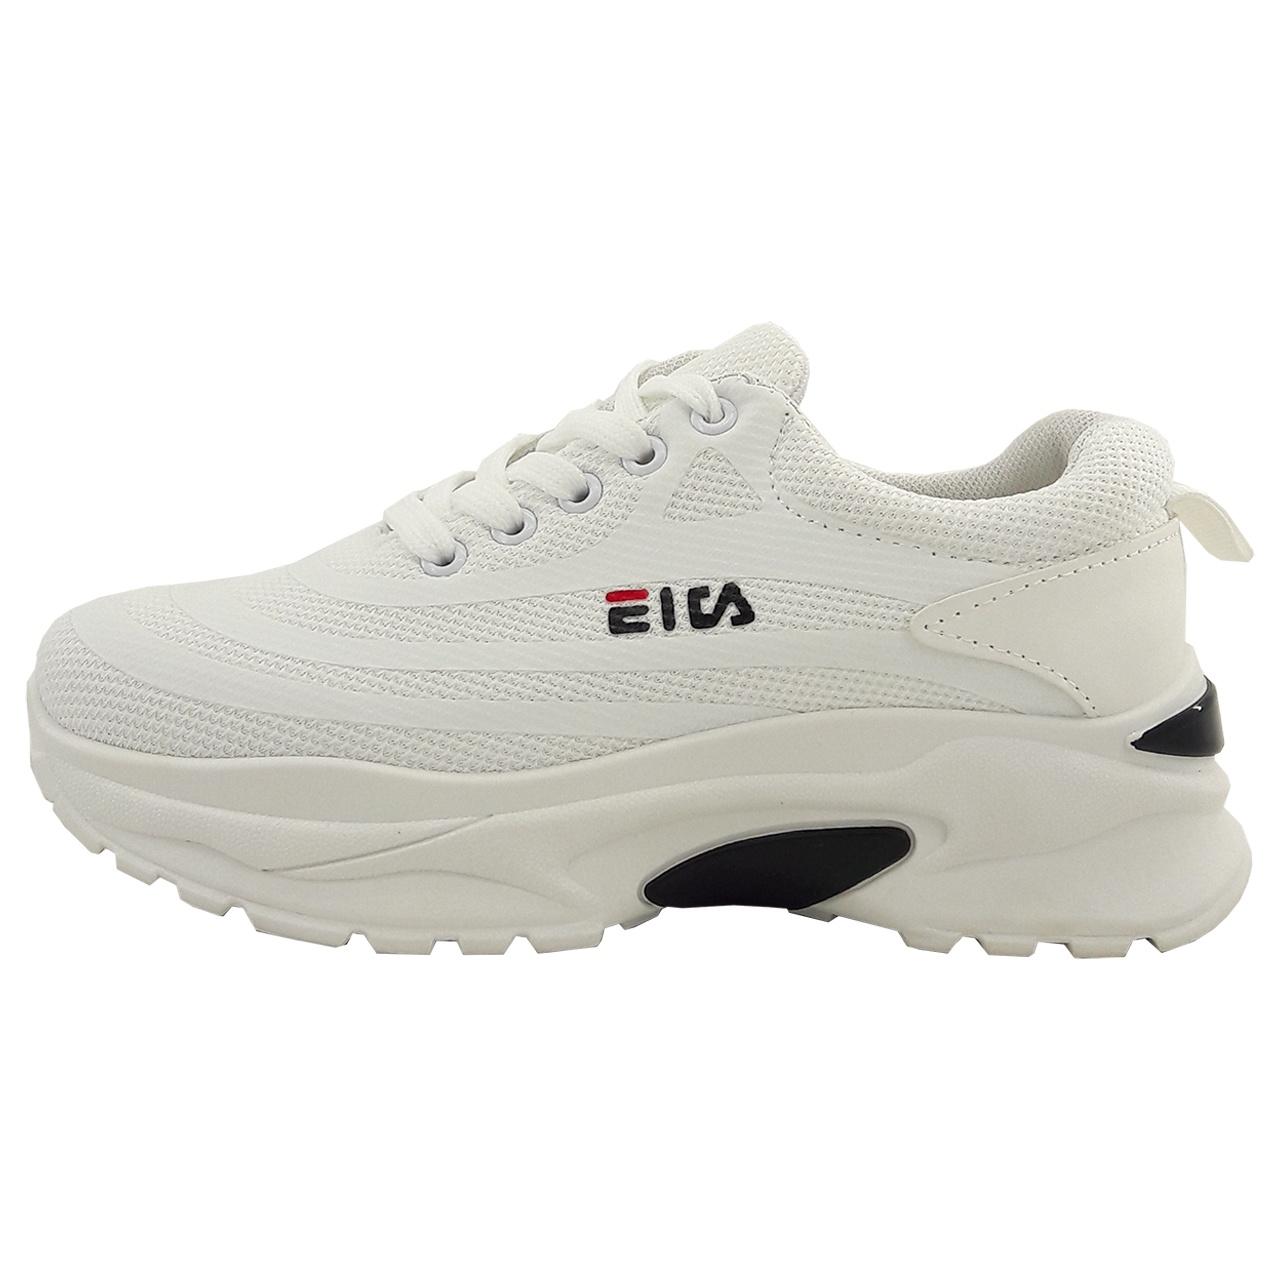 کفش راحتی زنانه ایلا مدل Sport wh01